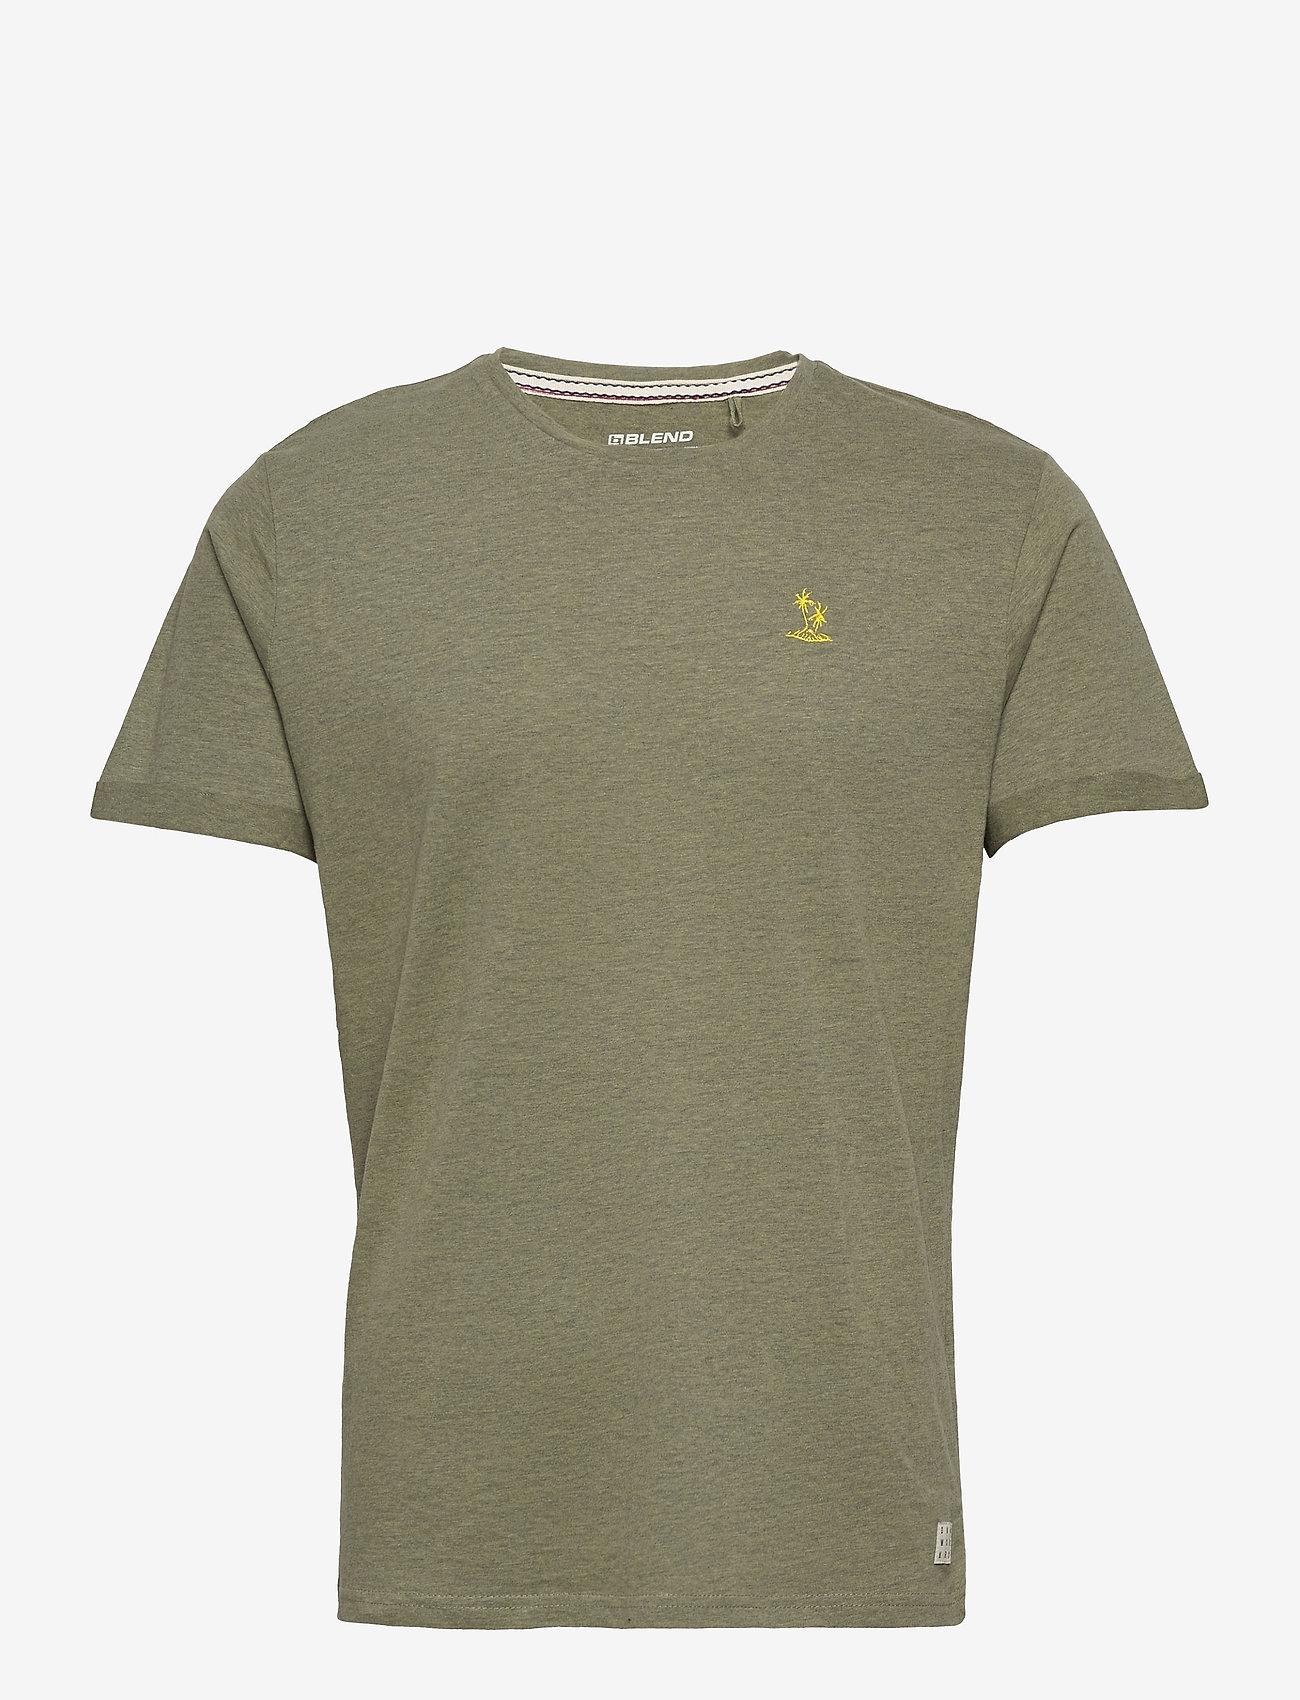 Blend - Tee - t-shirts basiques - oil green - 0